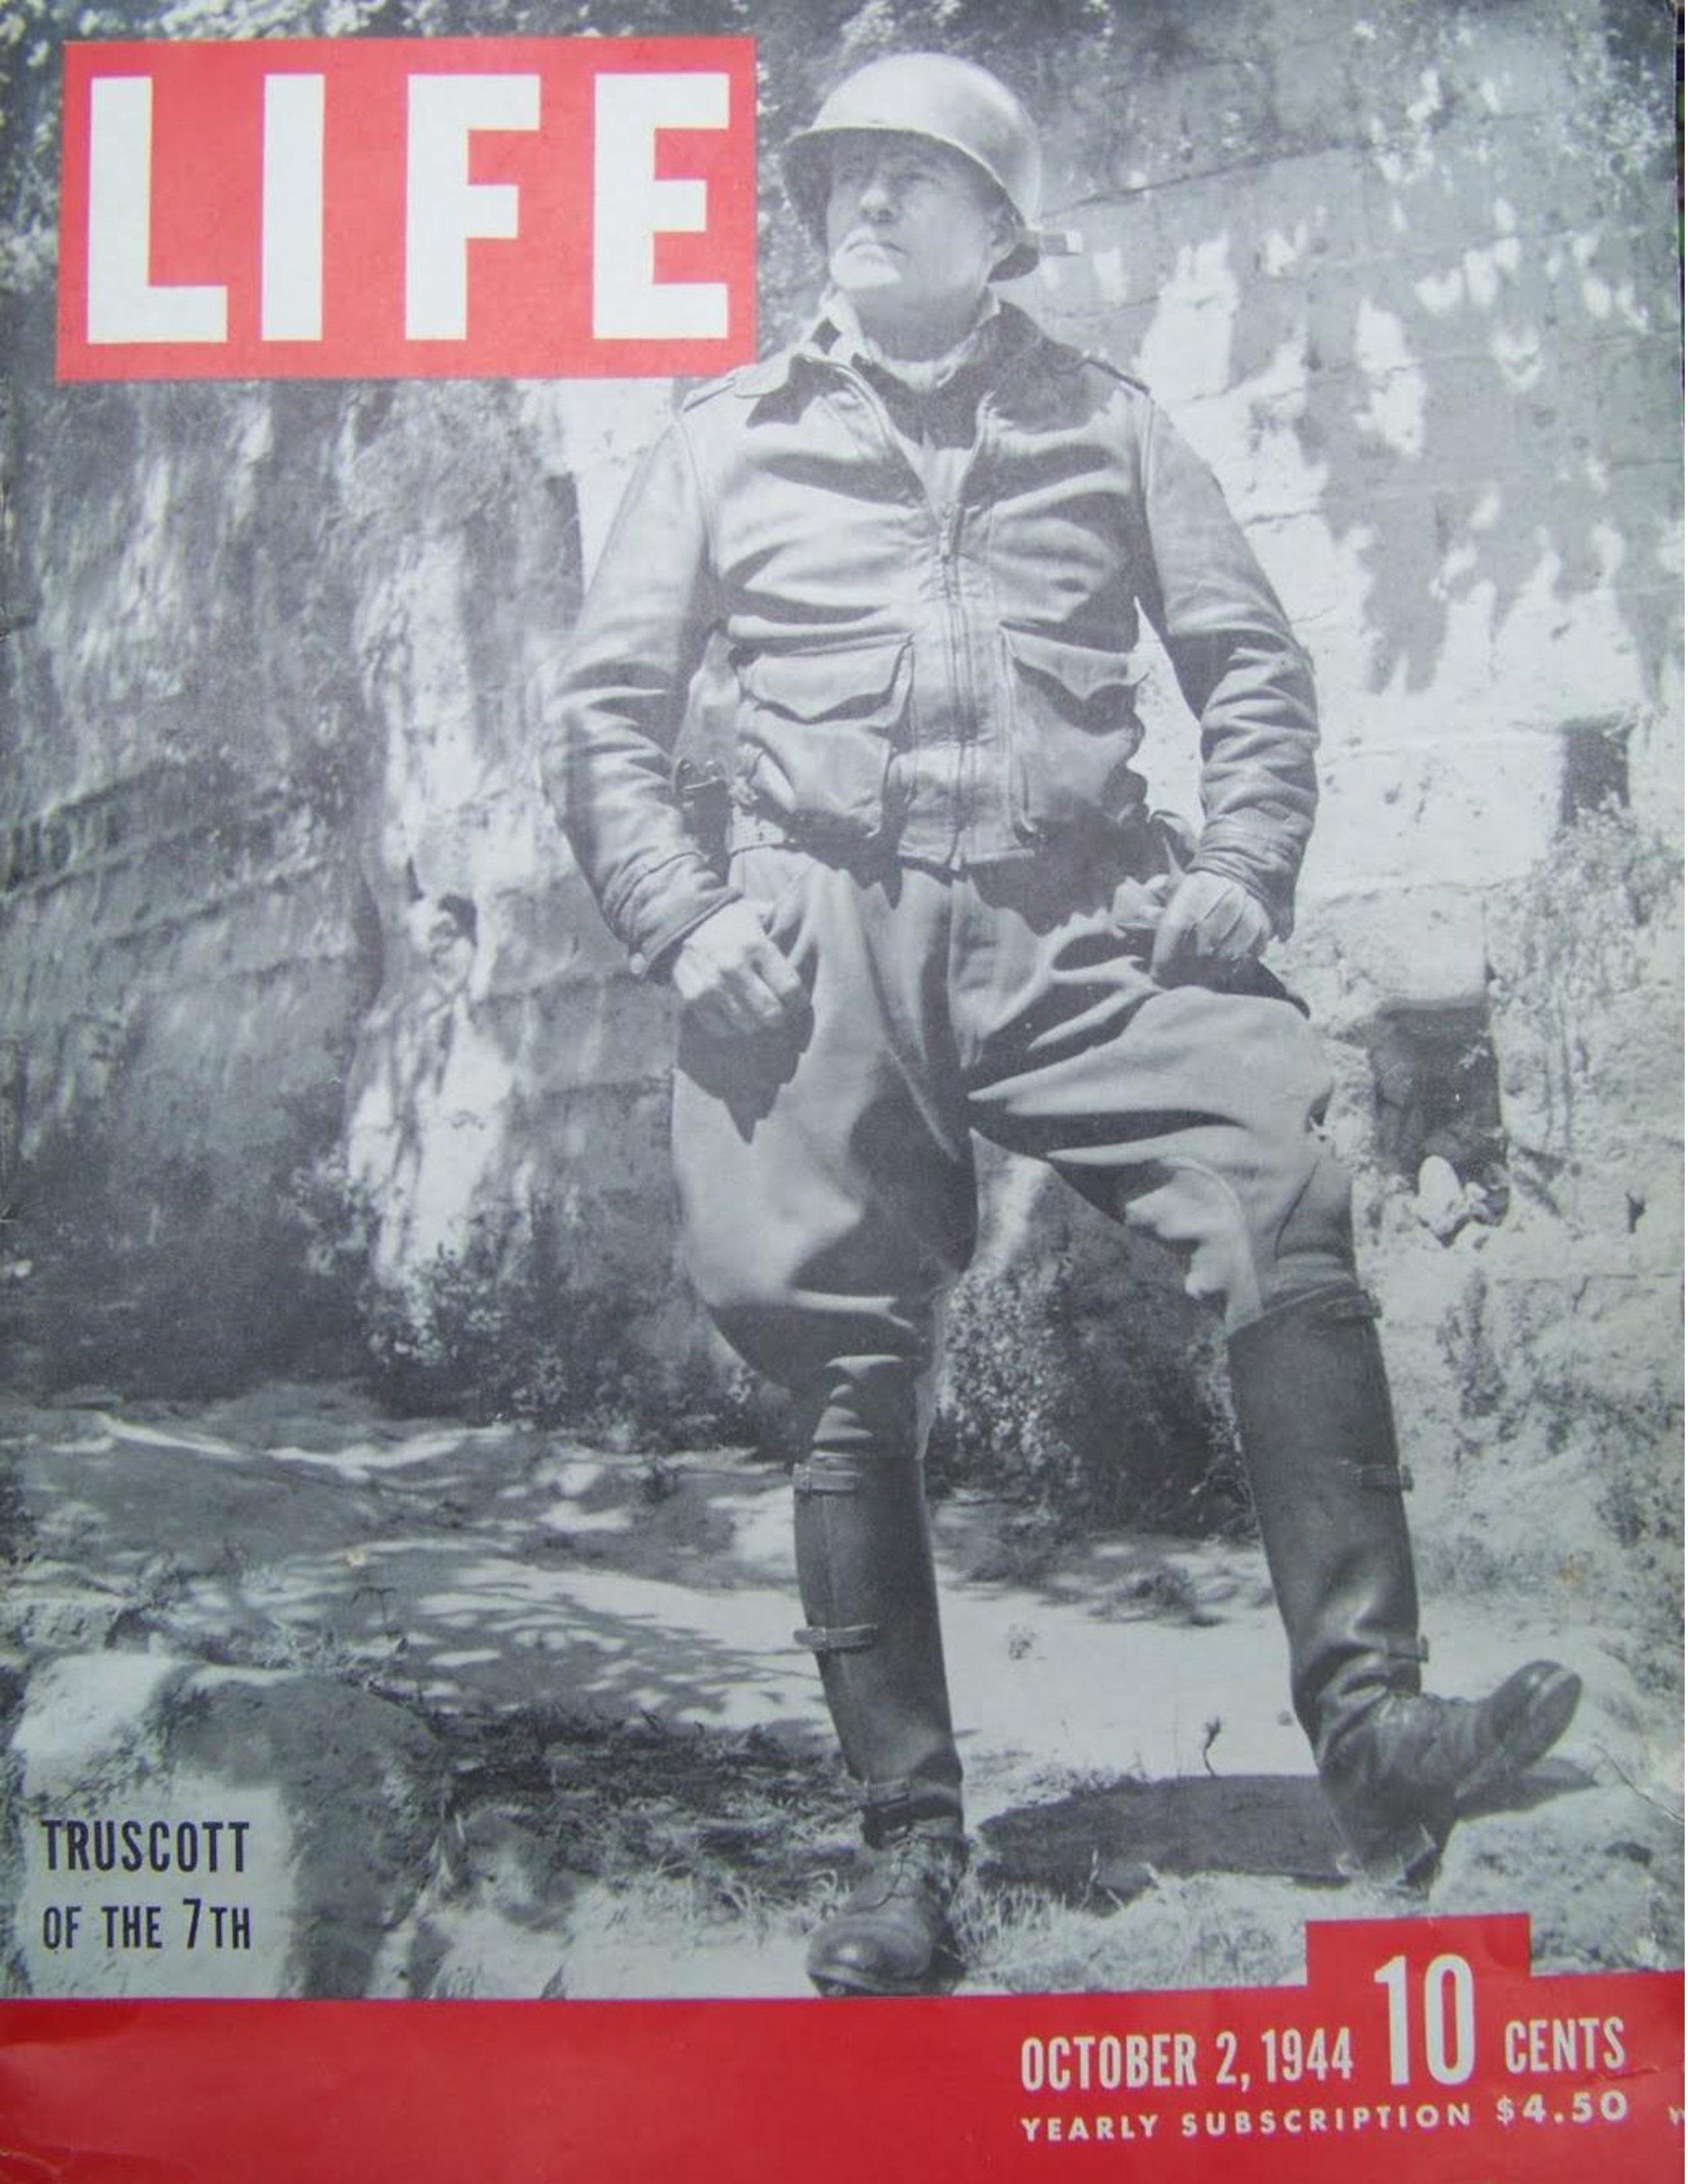 Lucian Truscott LIFE: Cover